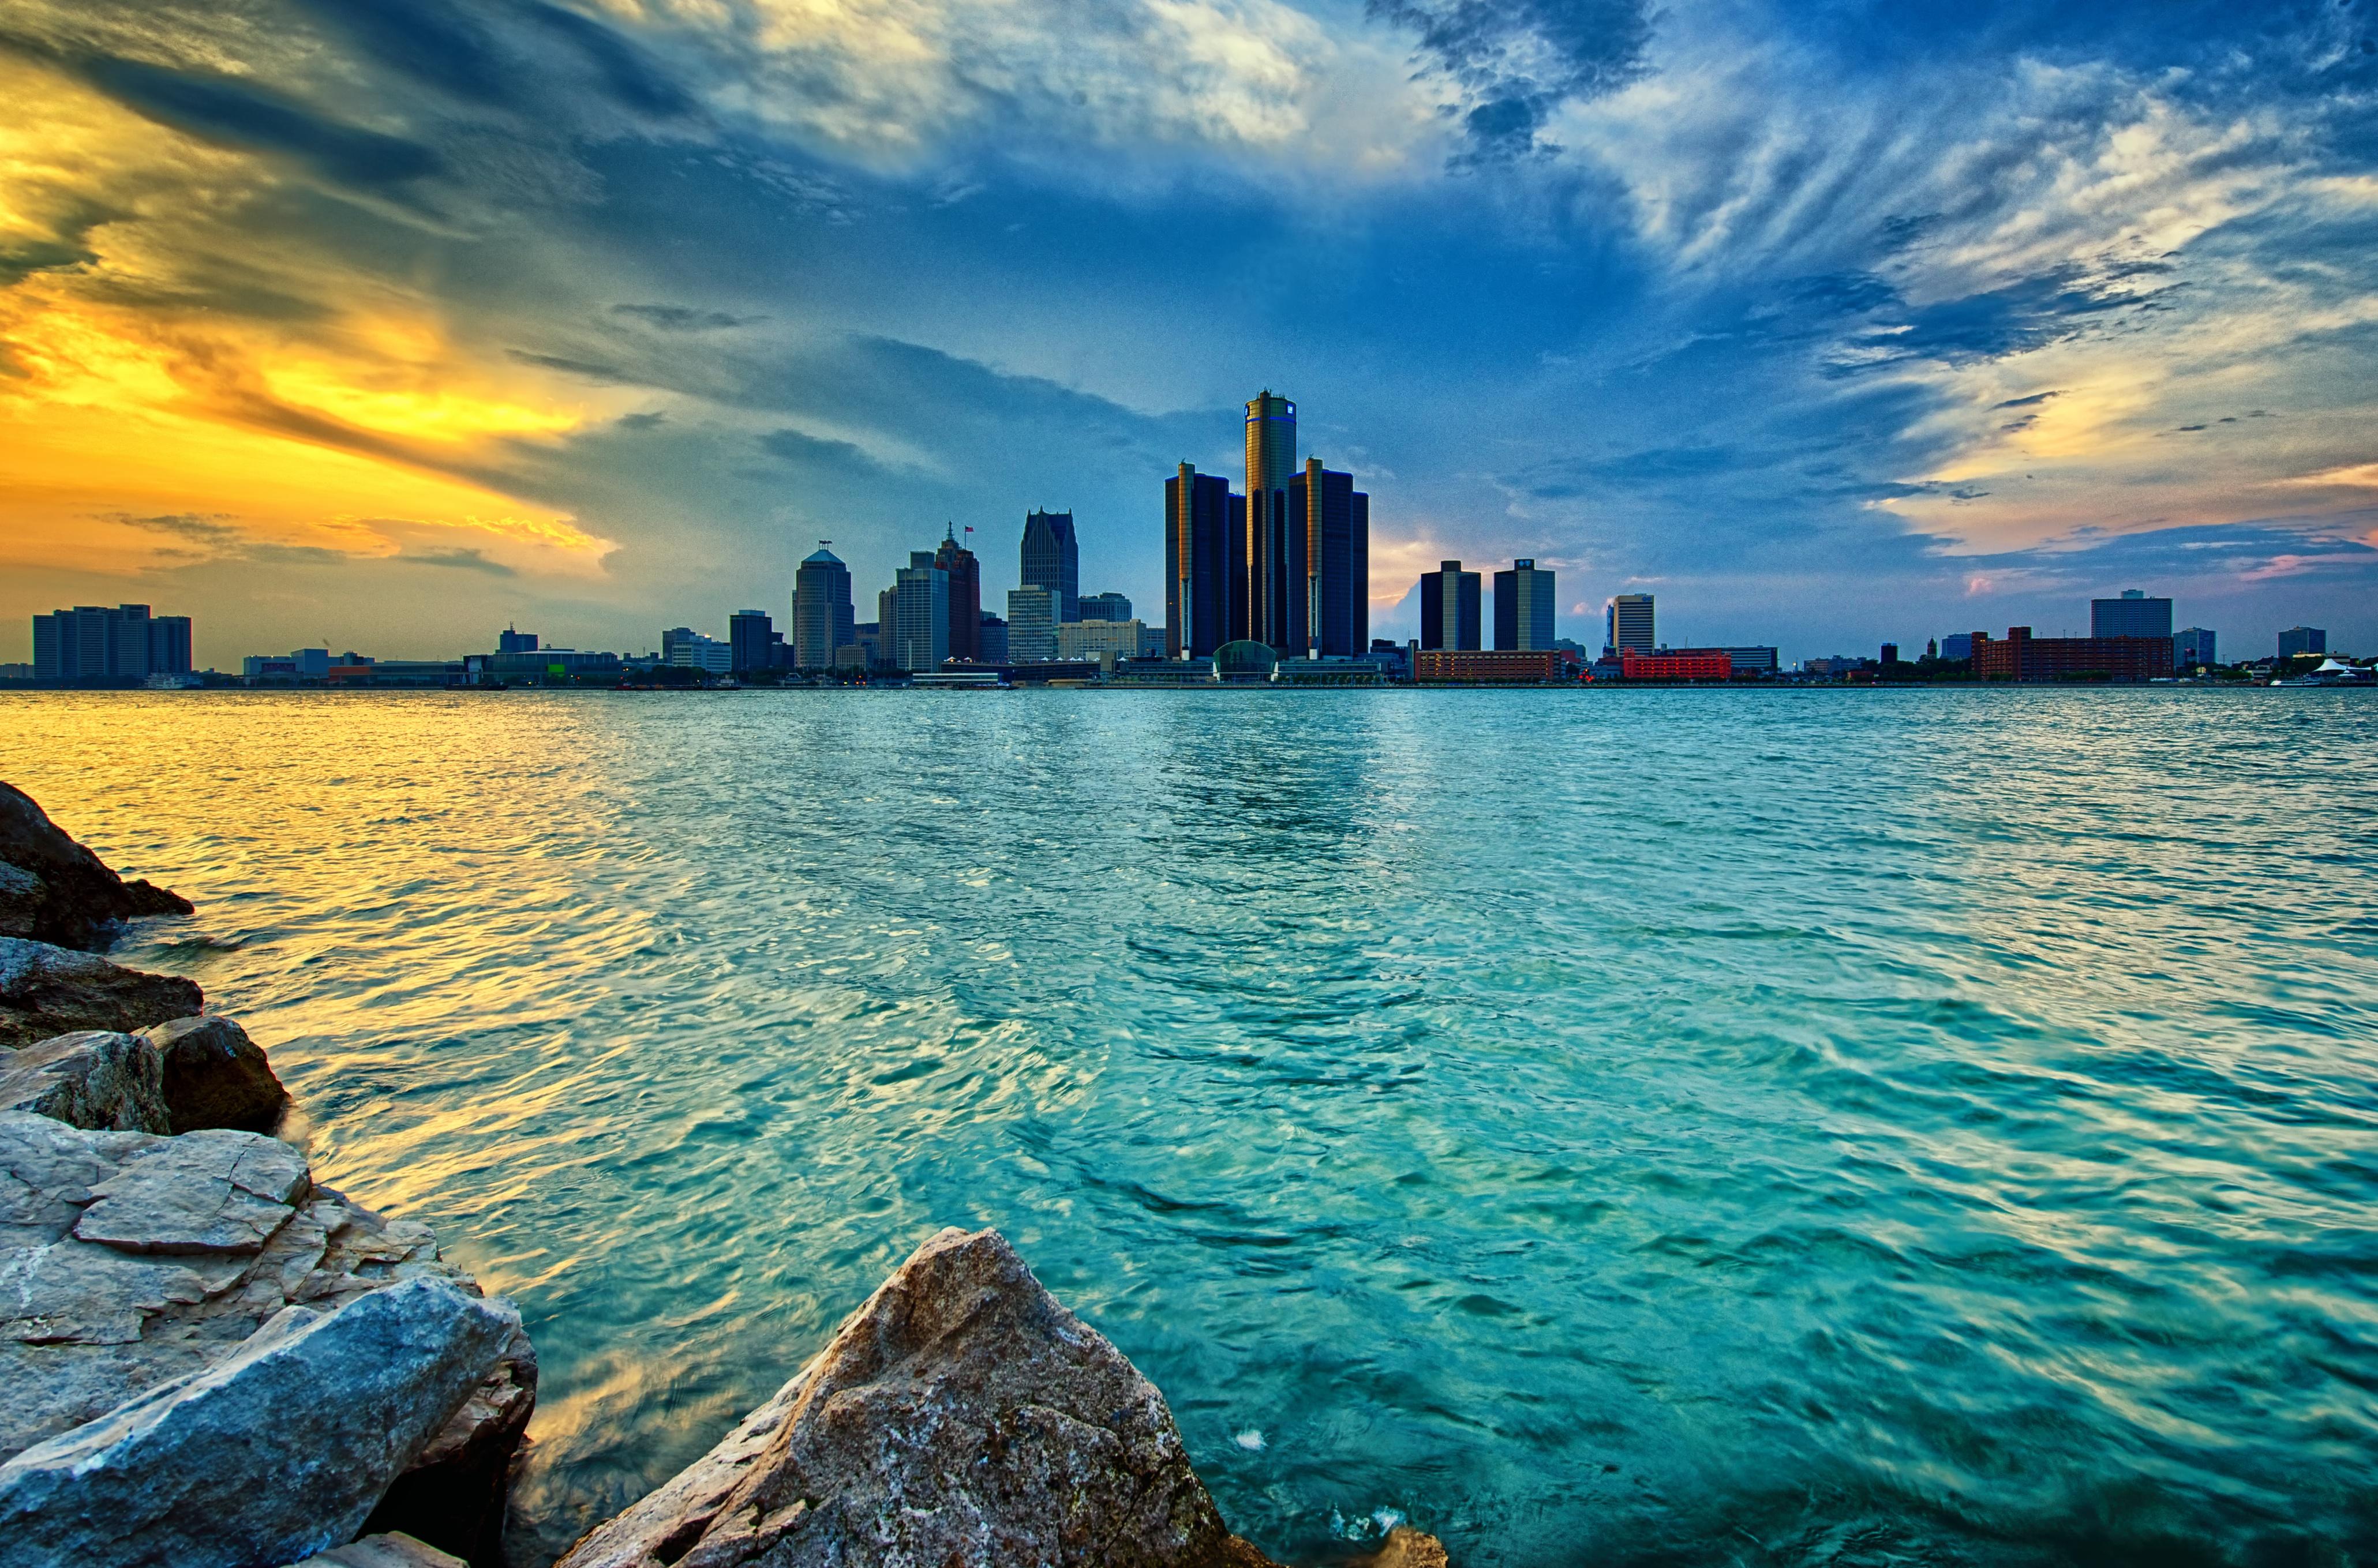 park city longexposure Ontario Canada water skyline rocks day cloudy fireworks Detroit windsor crowds detroitriver 55thanniversary